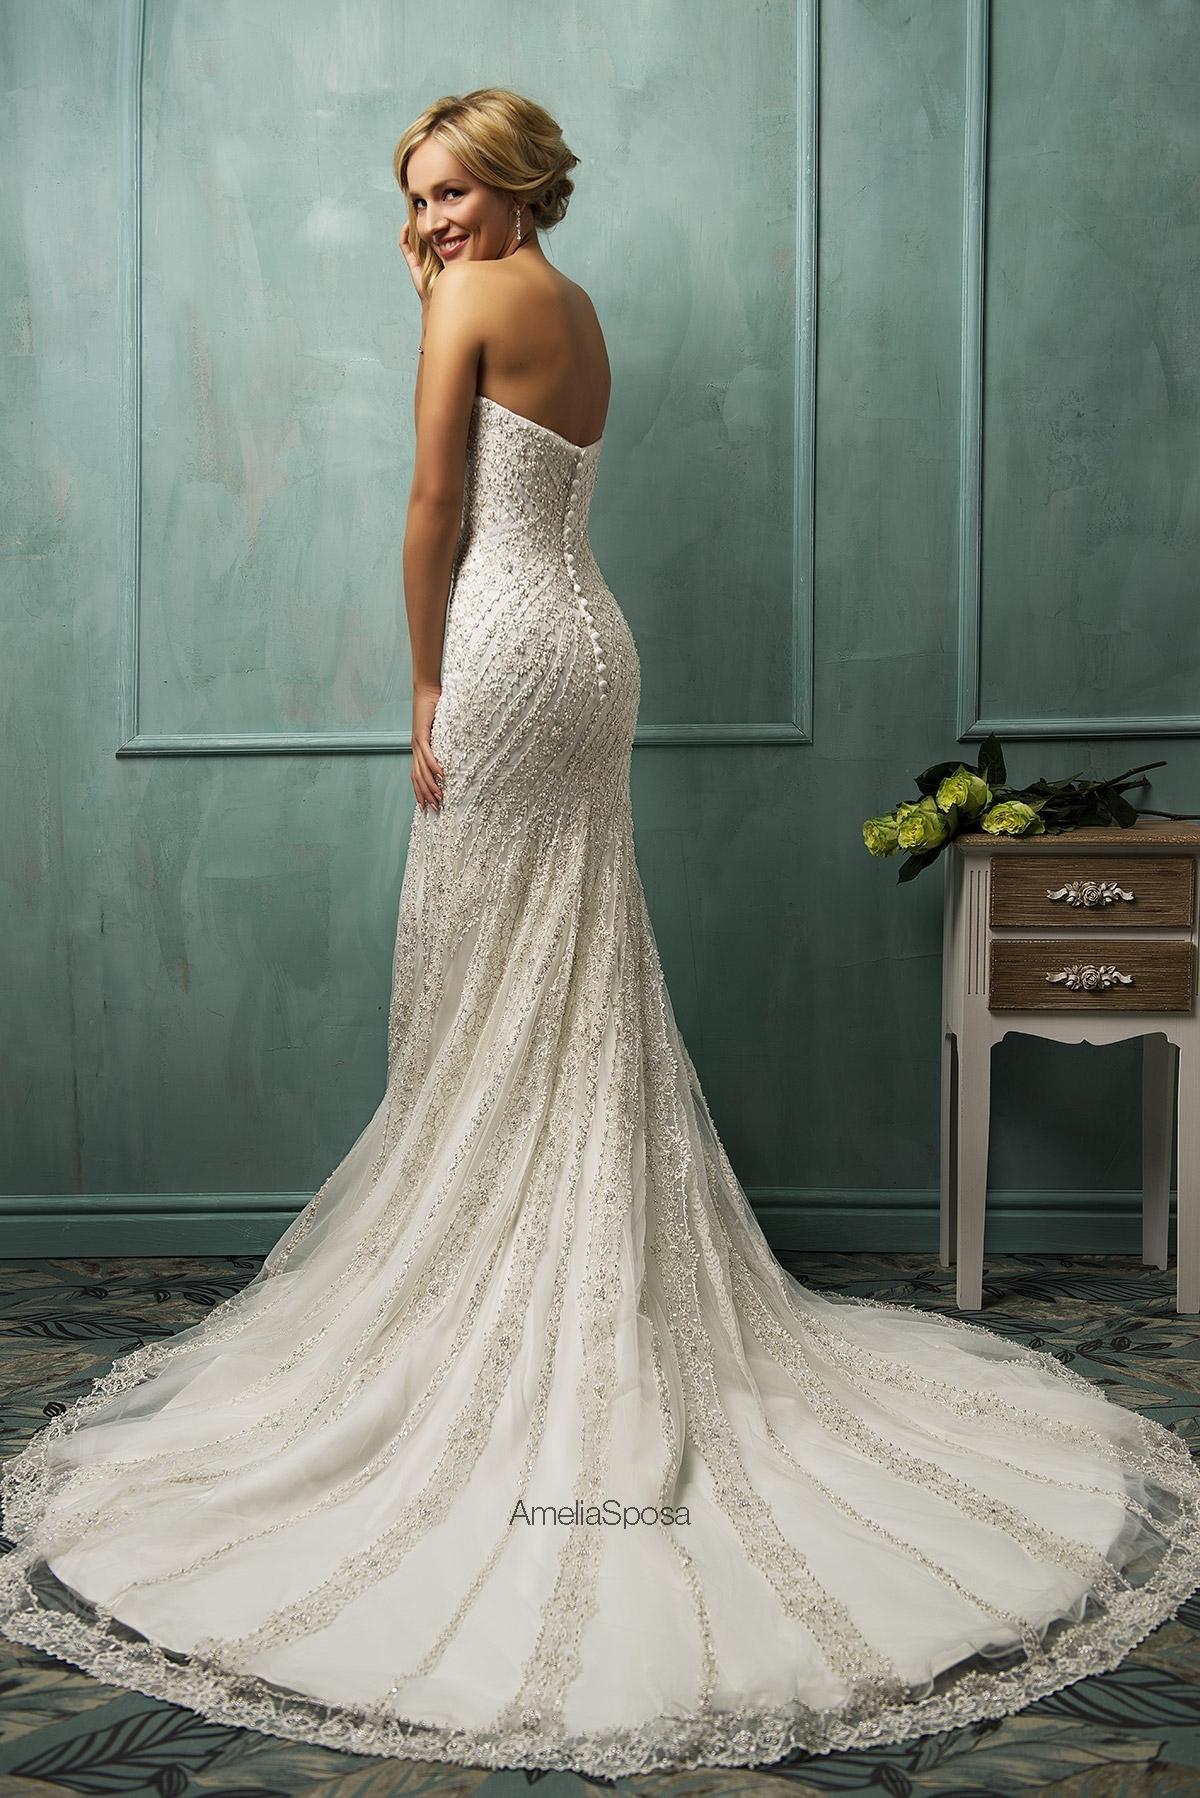 Inspired 2014 Mermaid Elegant Wedding Dress Appliqued